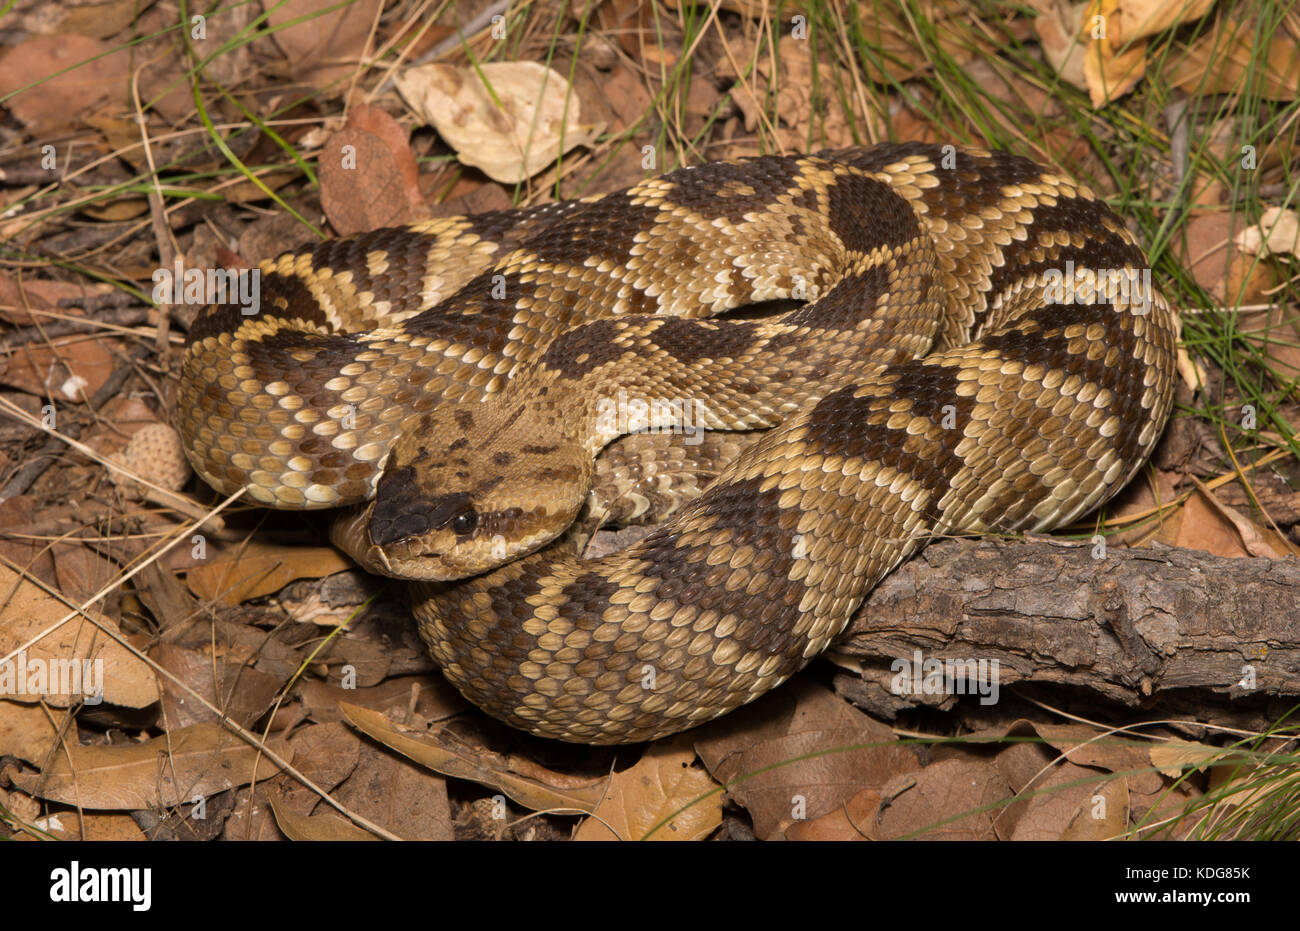 Western Black-tailed Rattlesnake (Crotalus molossus) from Cochise County, Arizona, USA. Stock Photo